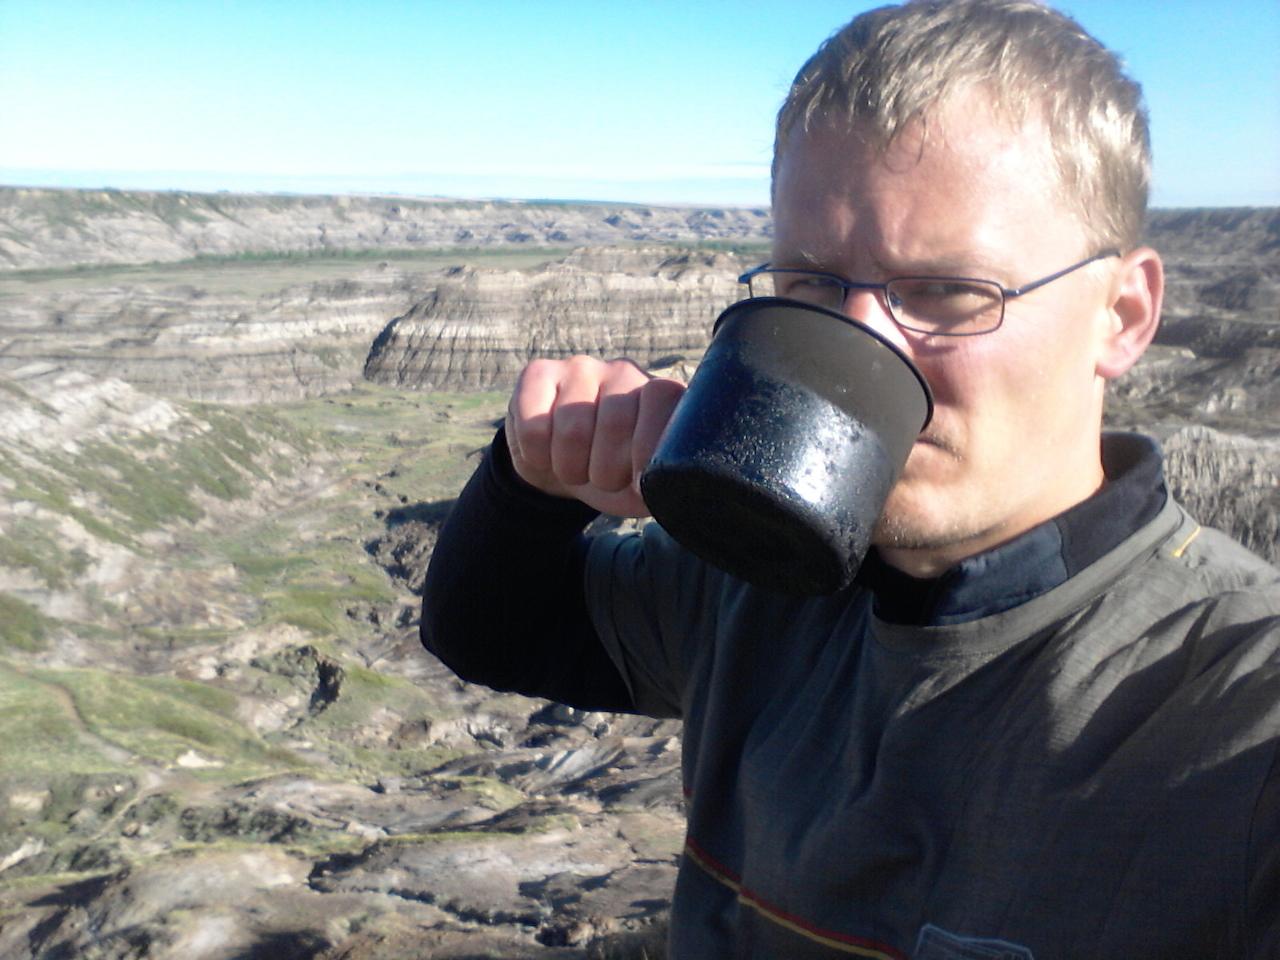 Snídaně @ Horsethief canyon